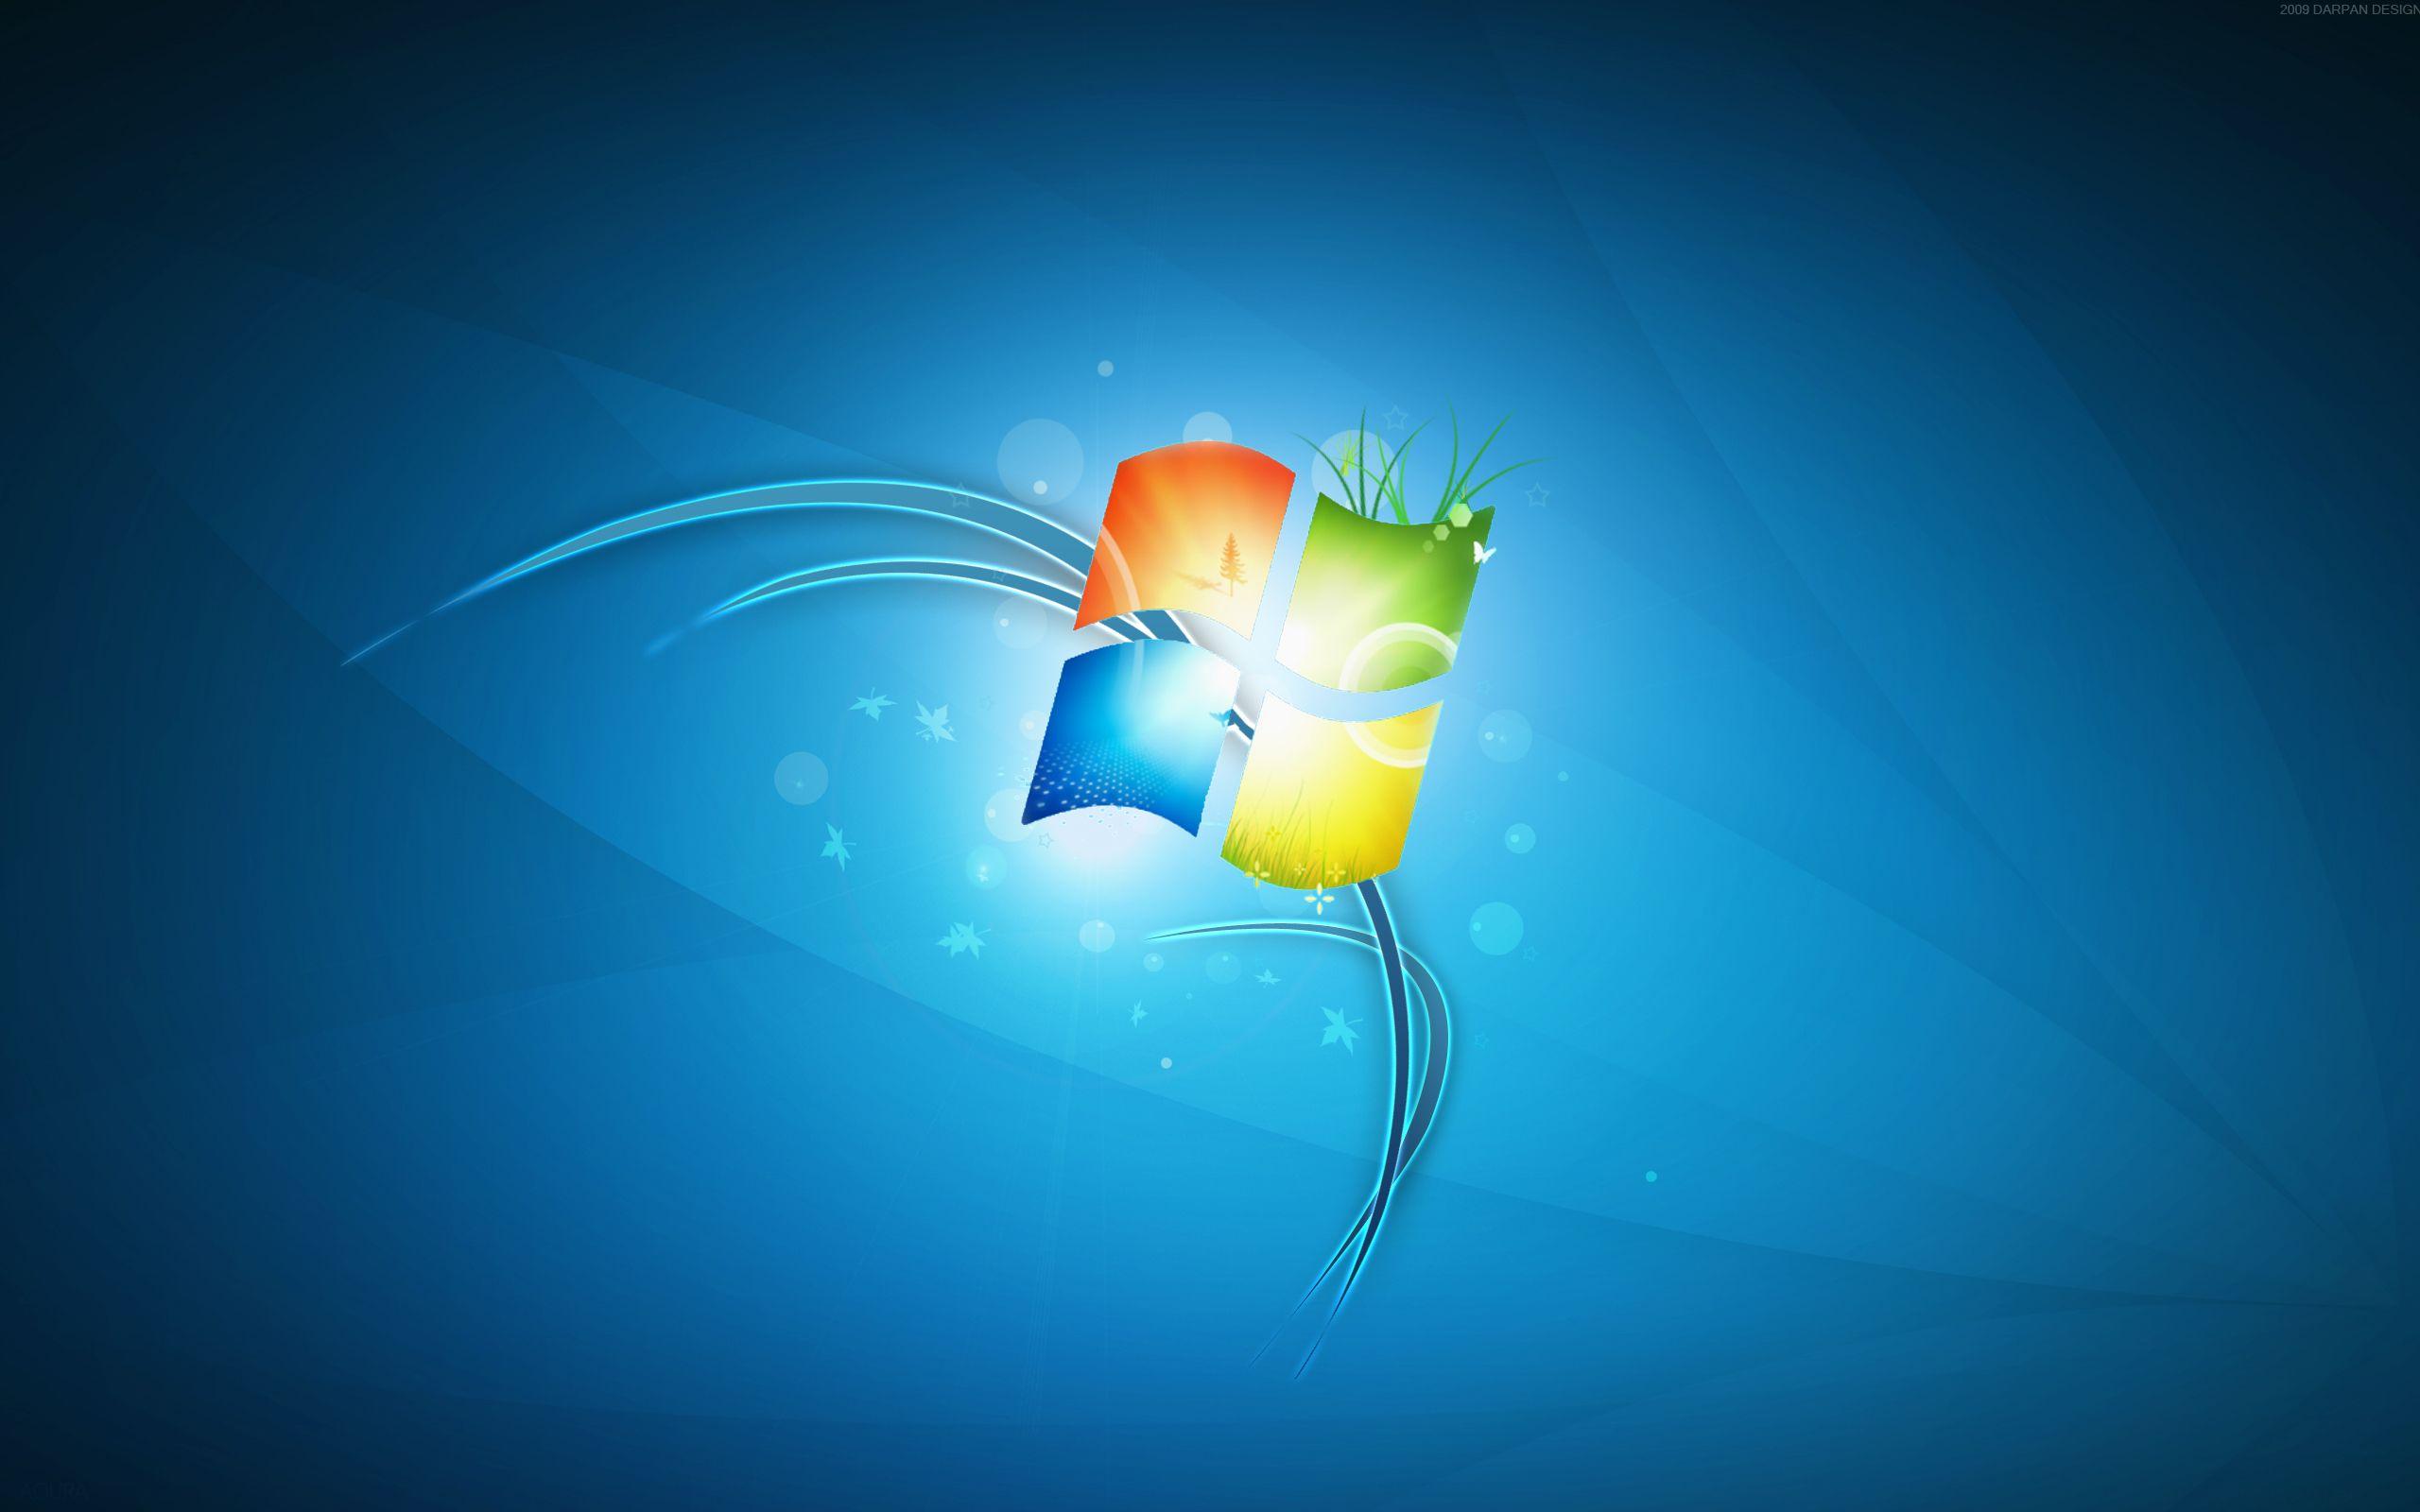 Presentacion De Imagenes De Windows Windows Wallpaper Desktop Themes Love Wallpaper Download